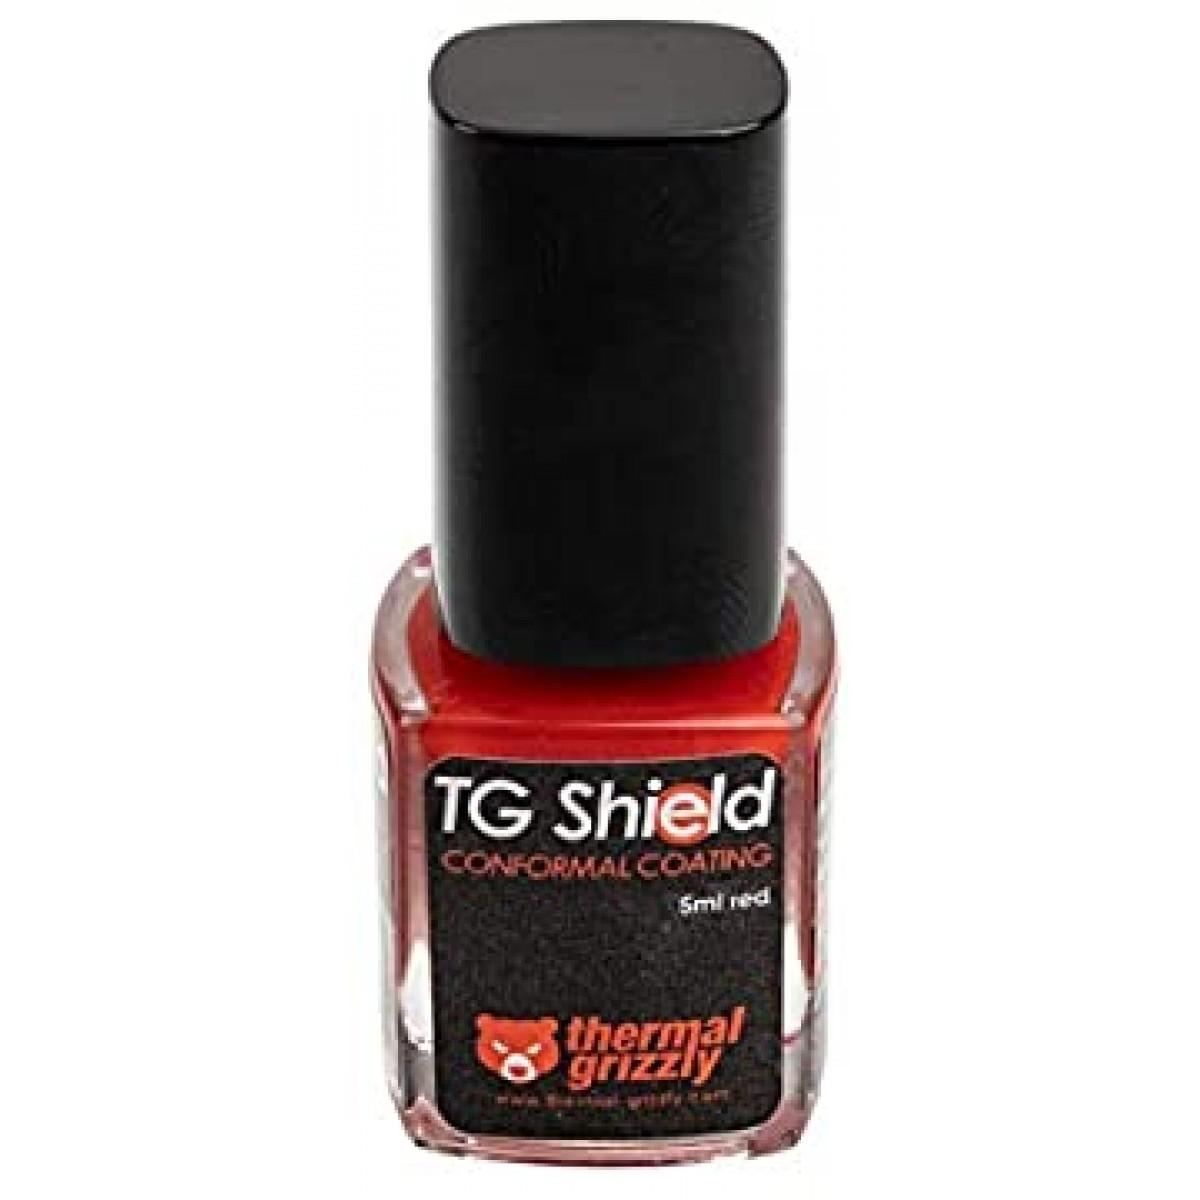 Verniz Protetor Thermal Grizzly Shield, 5ml, TG-ASH-050-RT